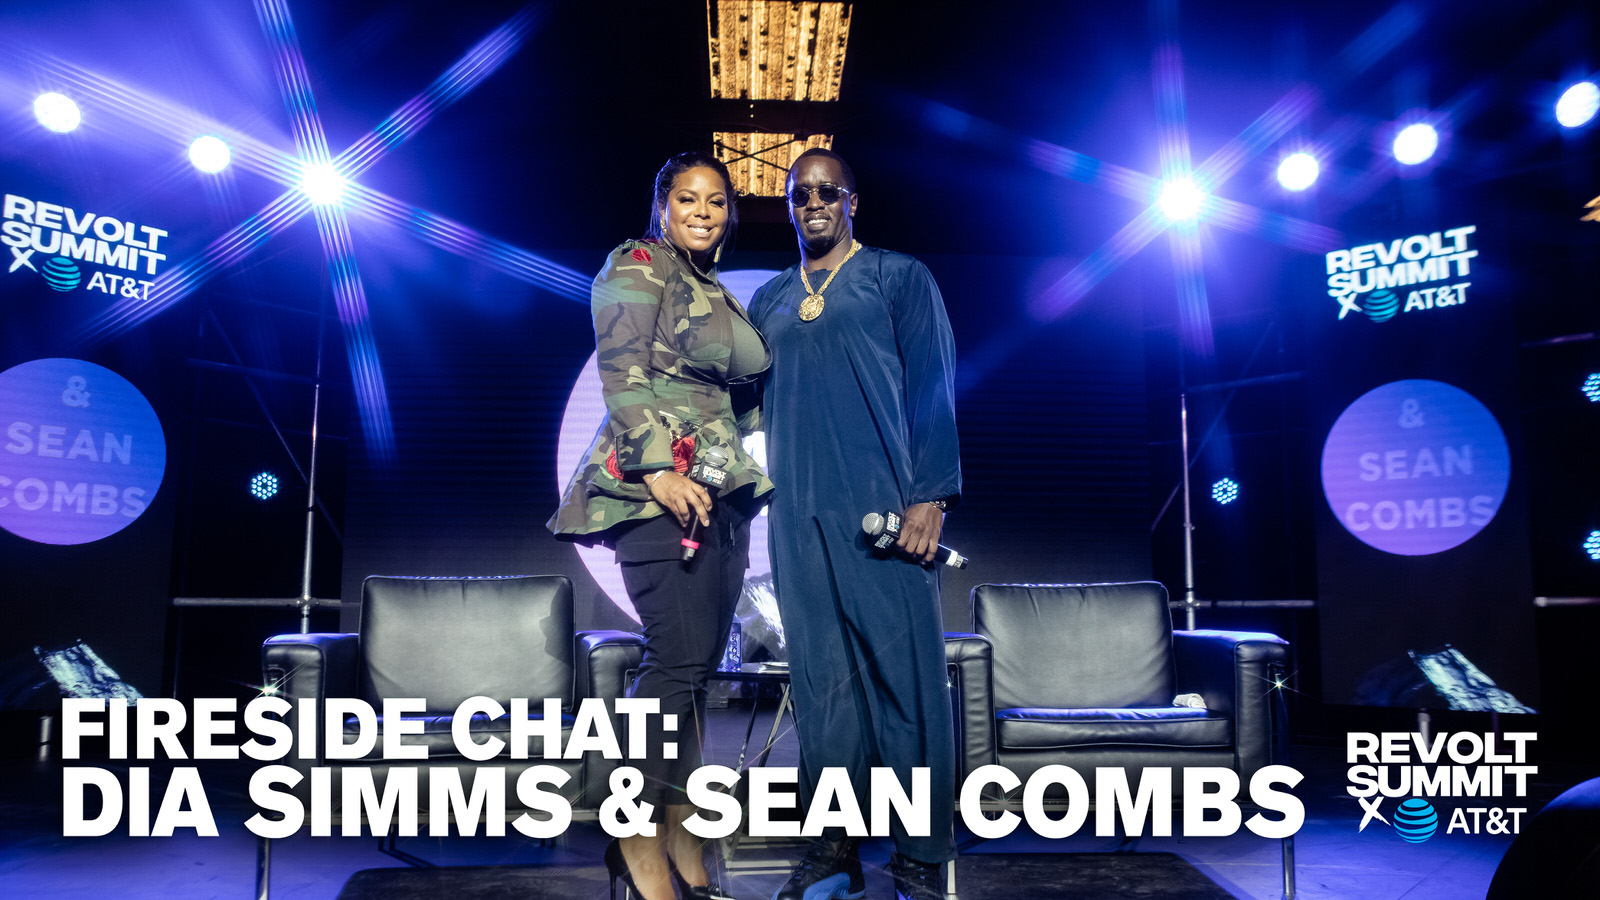 Dia Simms and Sean Combs